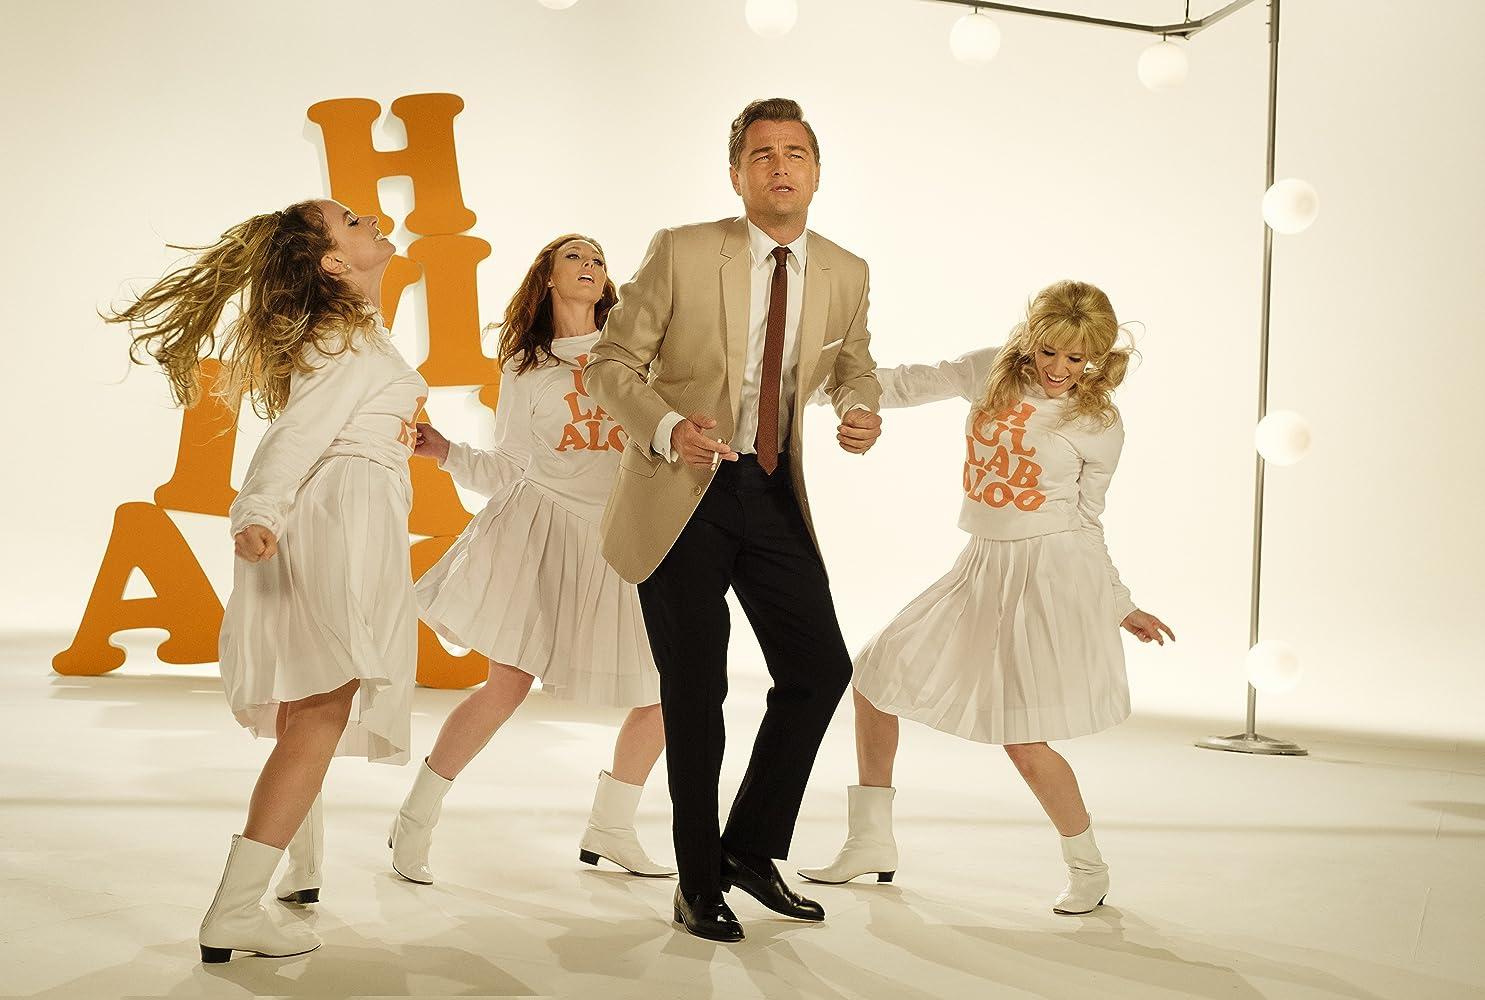 Leonardo DiCaprio, Michaela Sprague, Kayla Radomski, and Ryan Ramirez in Once Upon a Time ...in Hollywood (2019)